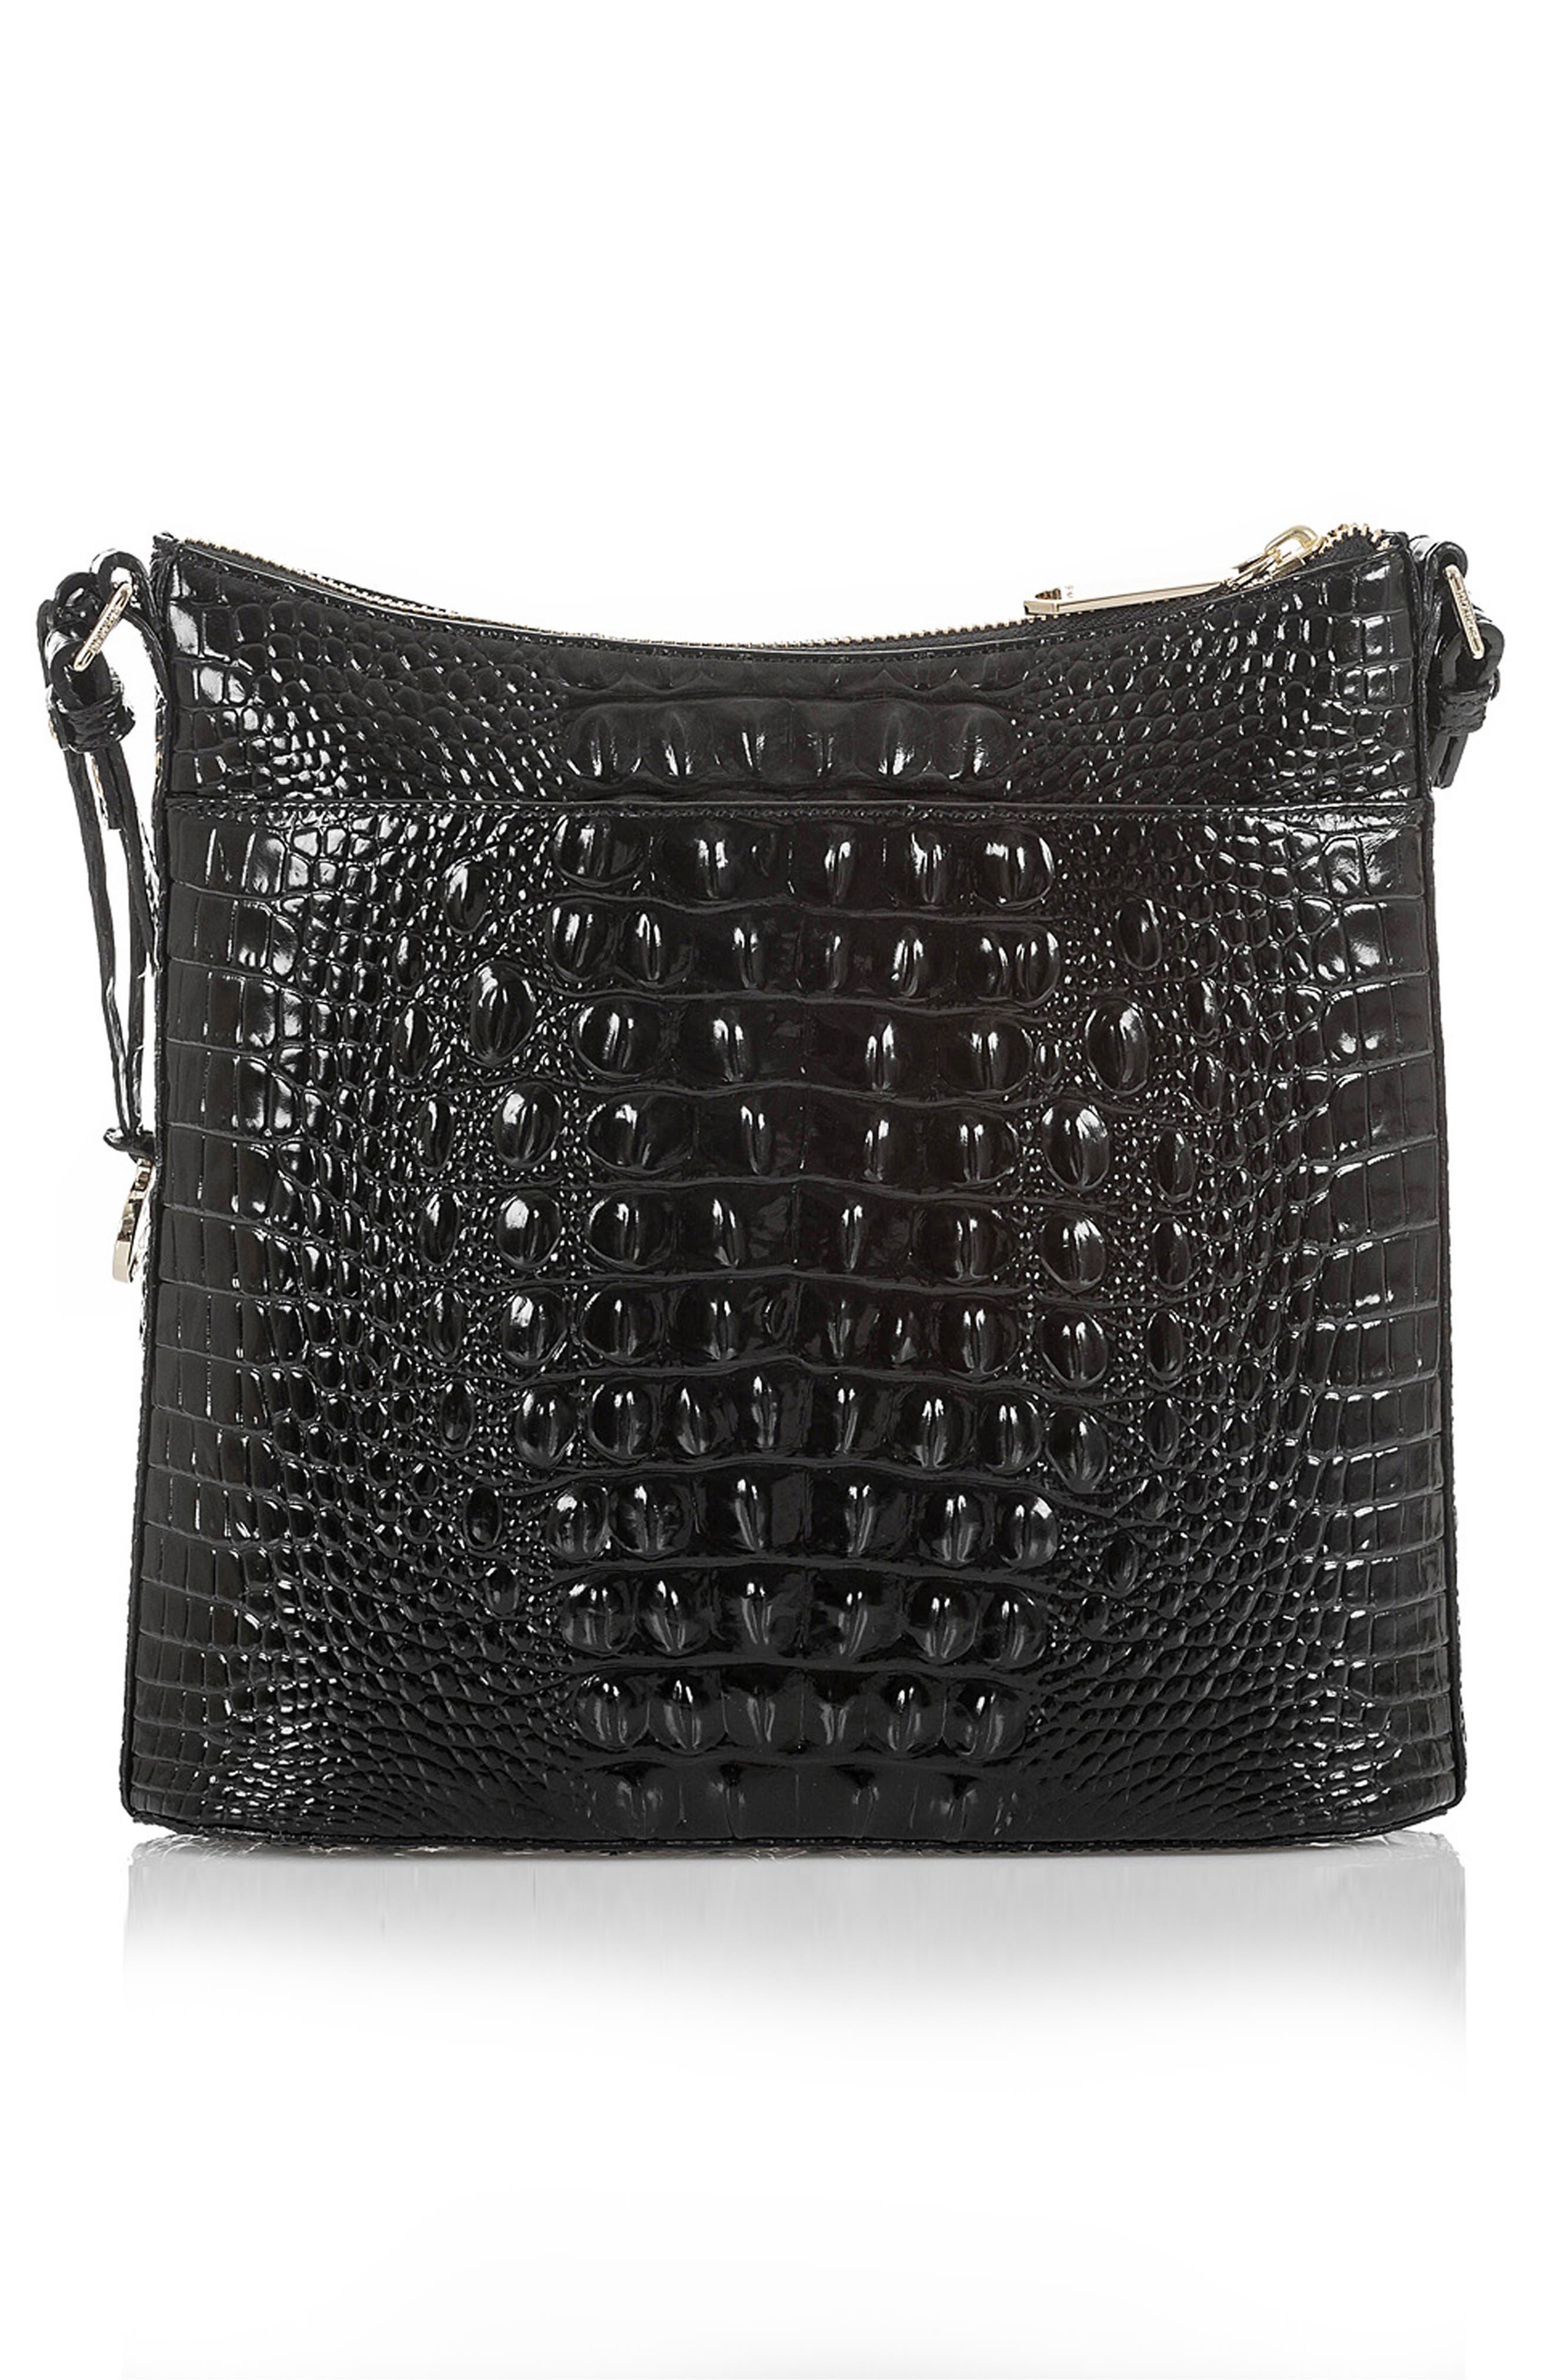 BRAHMIN, Katie Croc Embossed Leather Crossbody Bag, Alternate thumbnail 2, color, BLACK MEMBOURNE